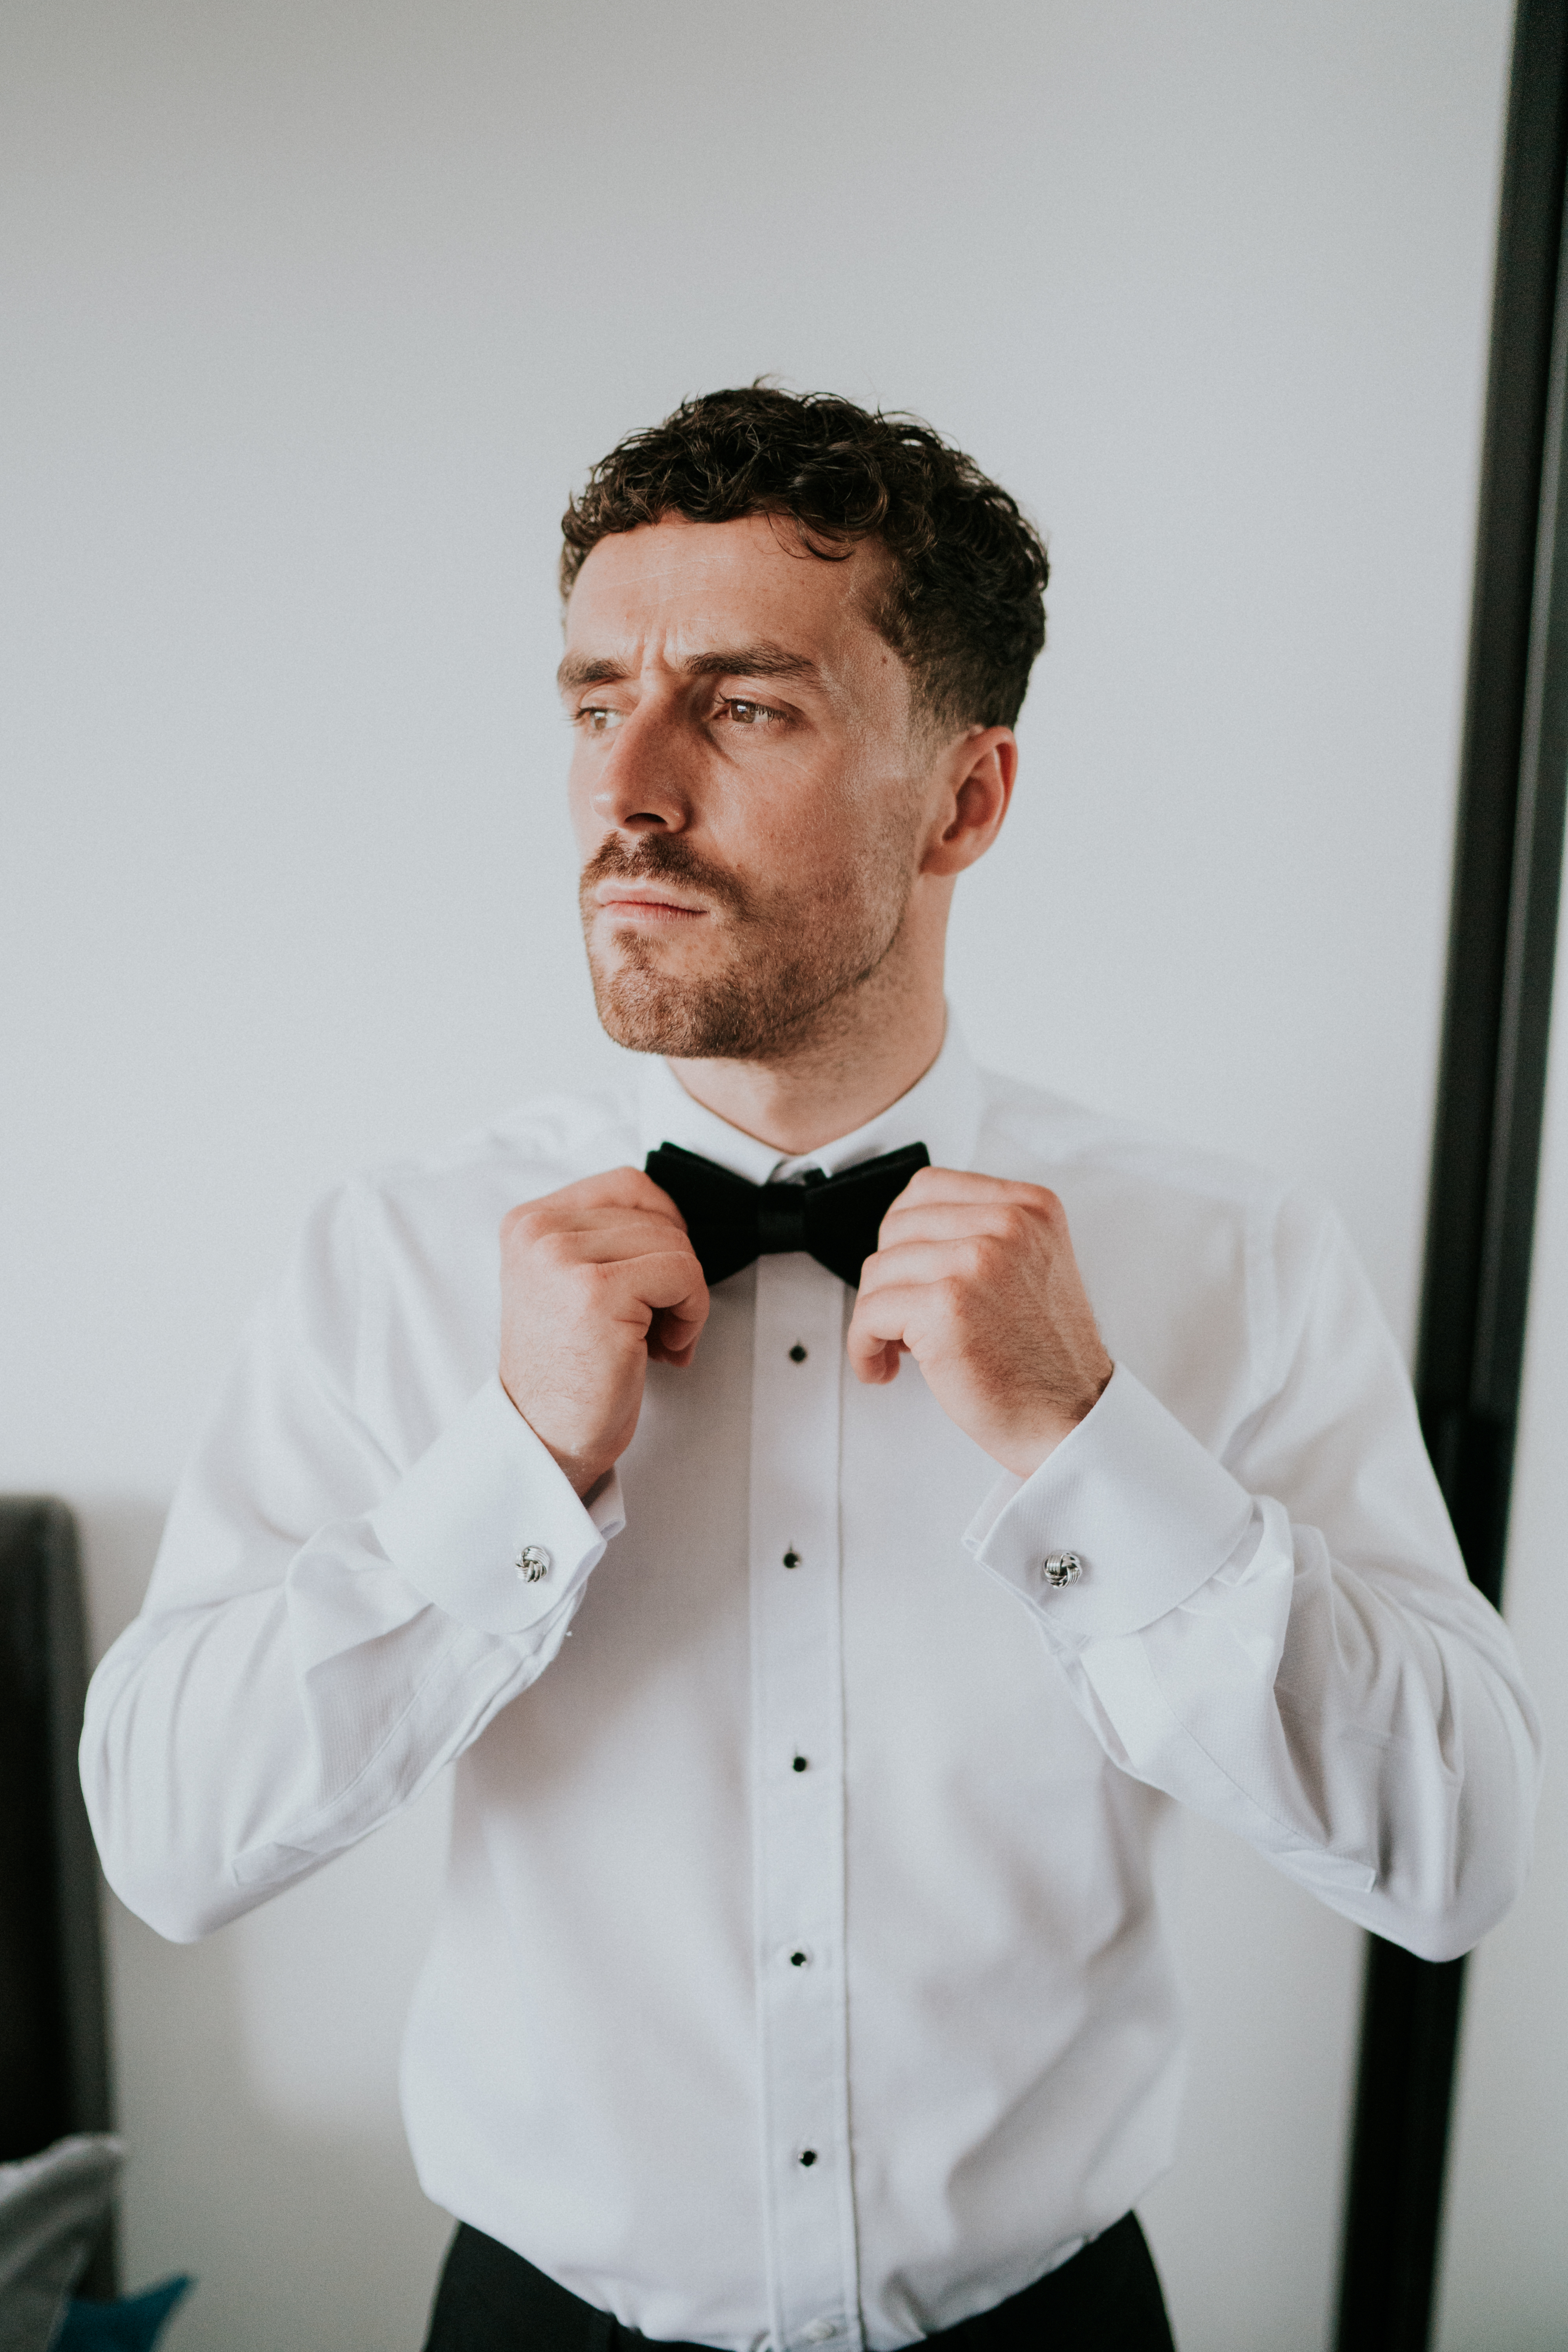 groom straightening tie